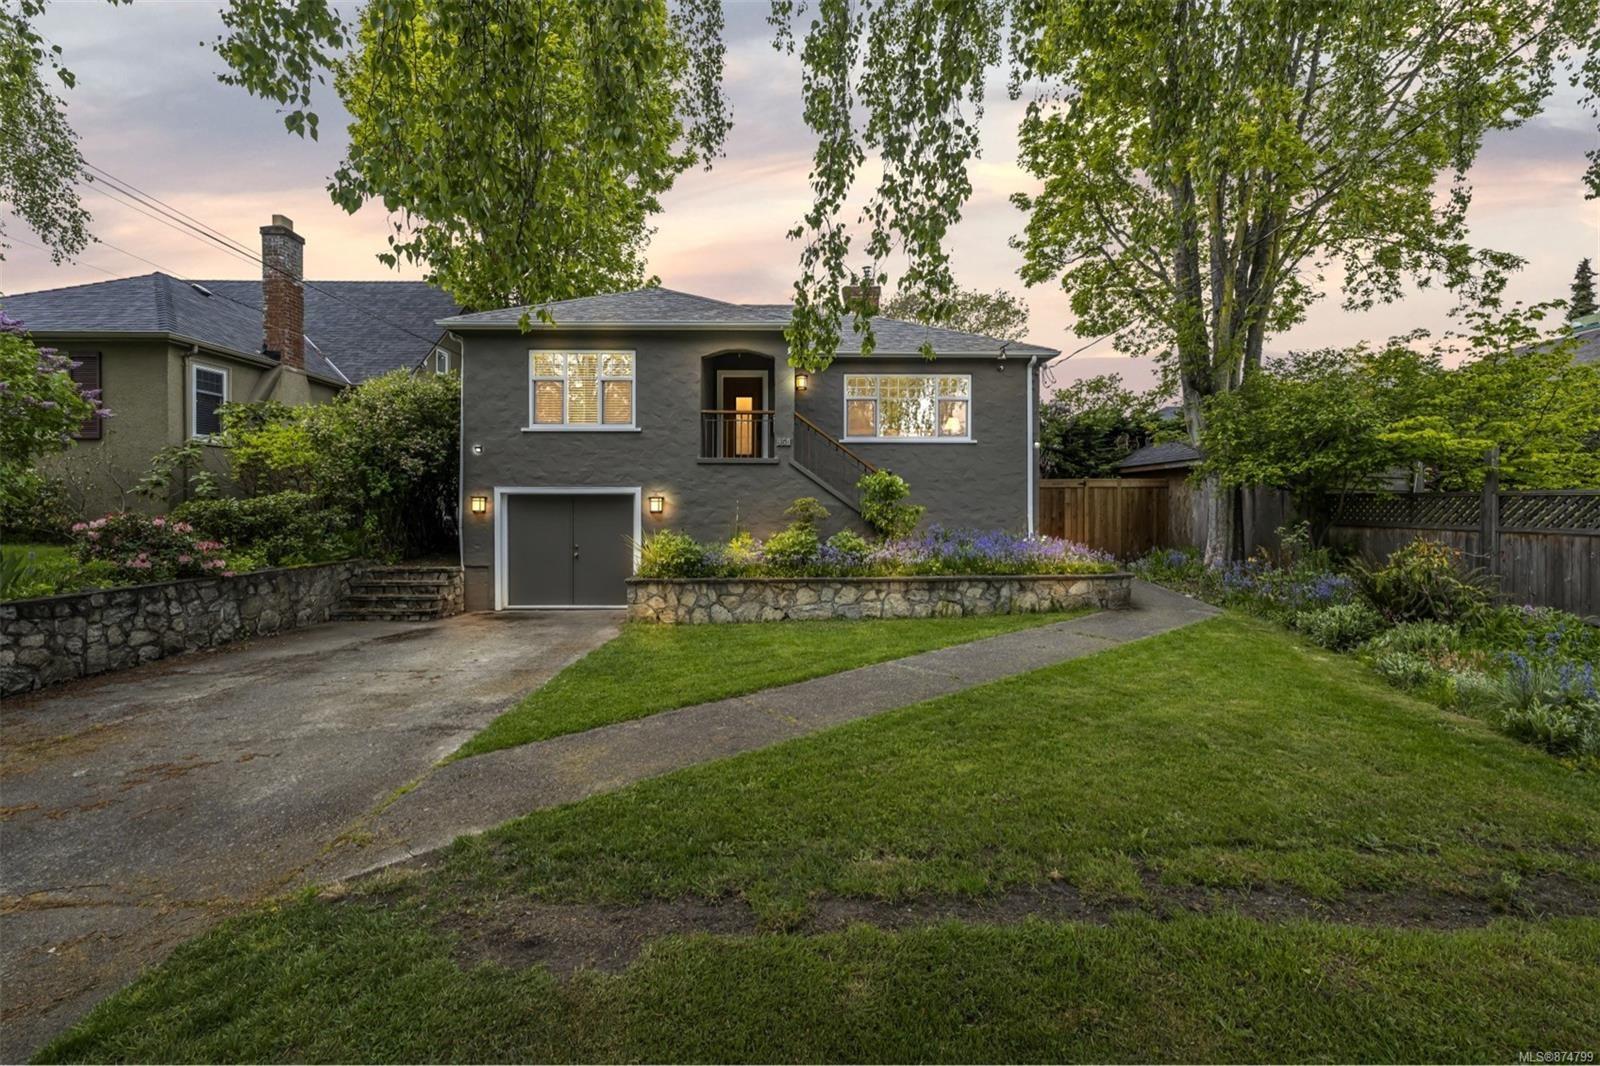 Main Photo: 958 Oliver St in : OB South Oak Bay House for sale (Oak Bay)  : MLS®# 874799